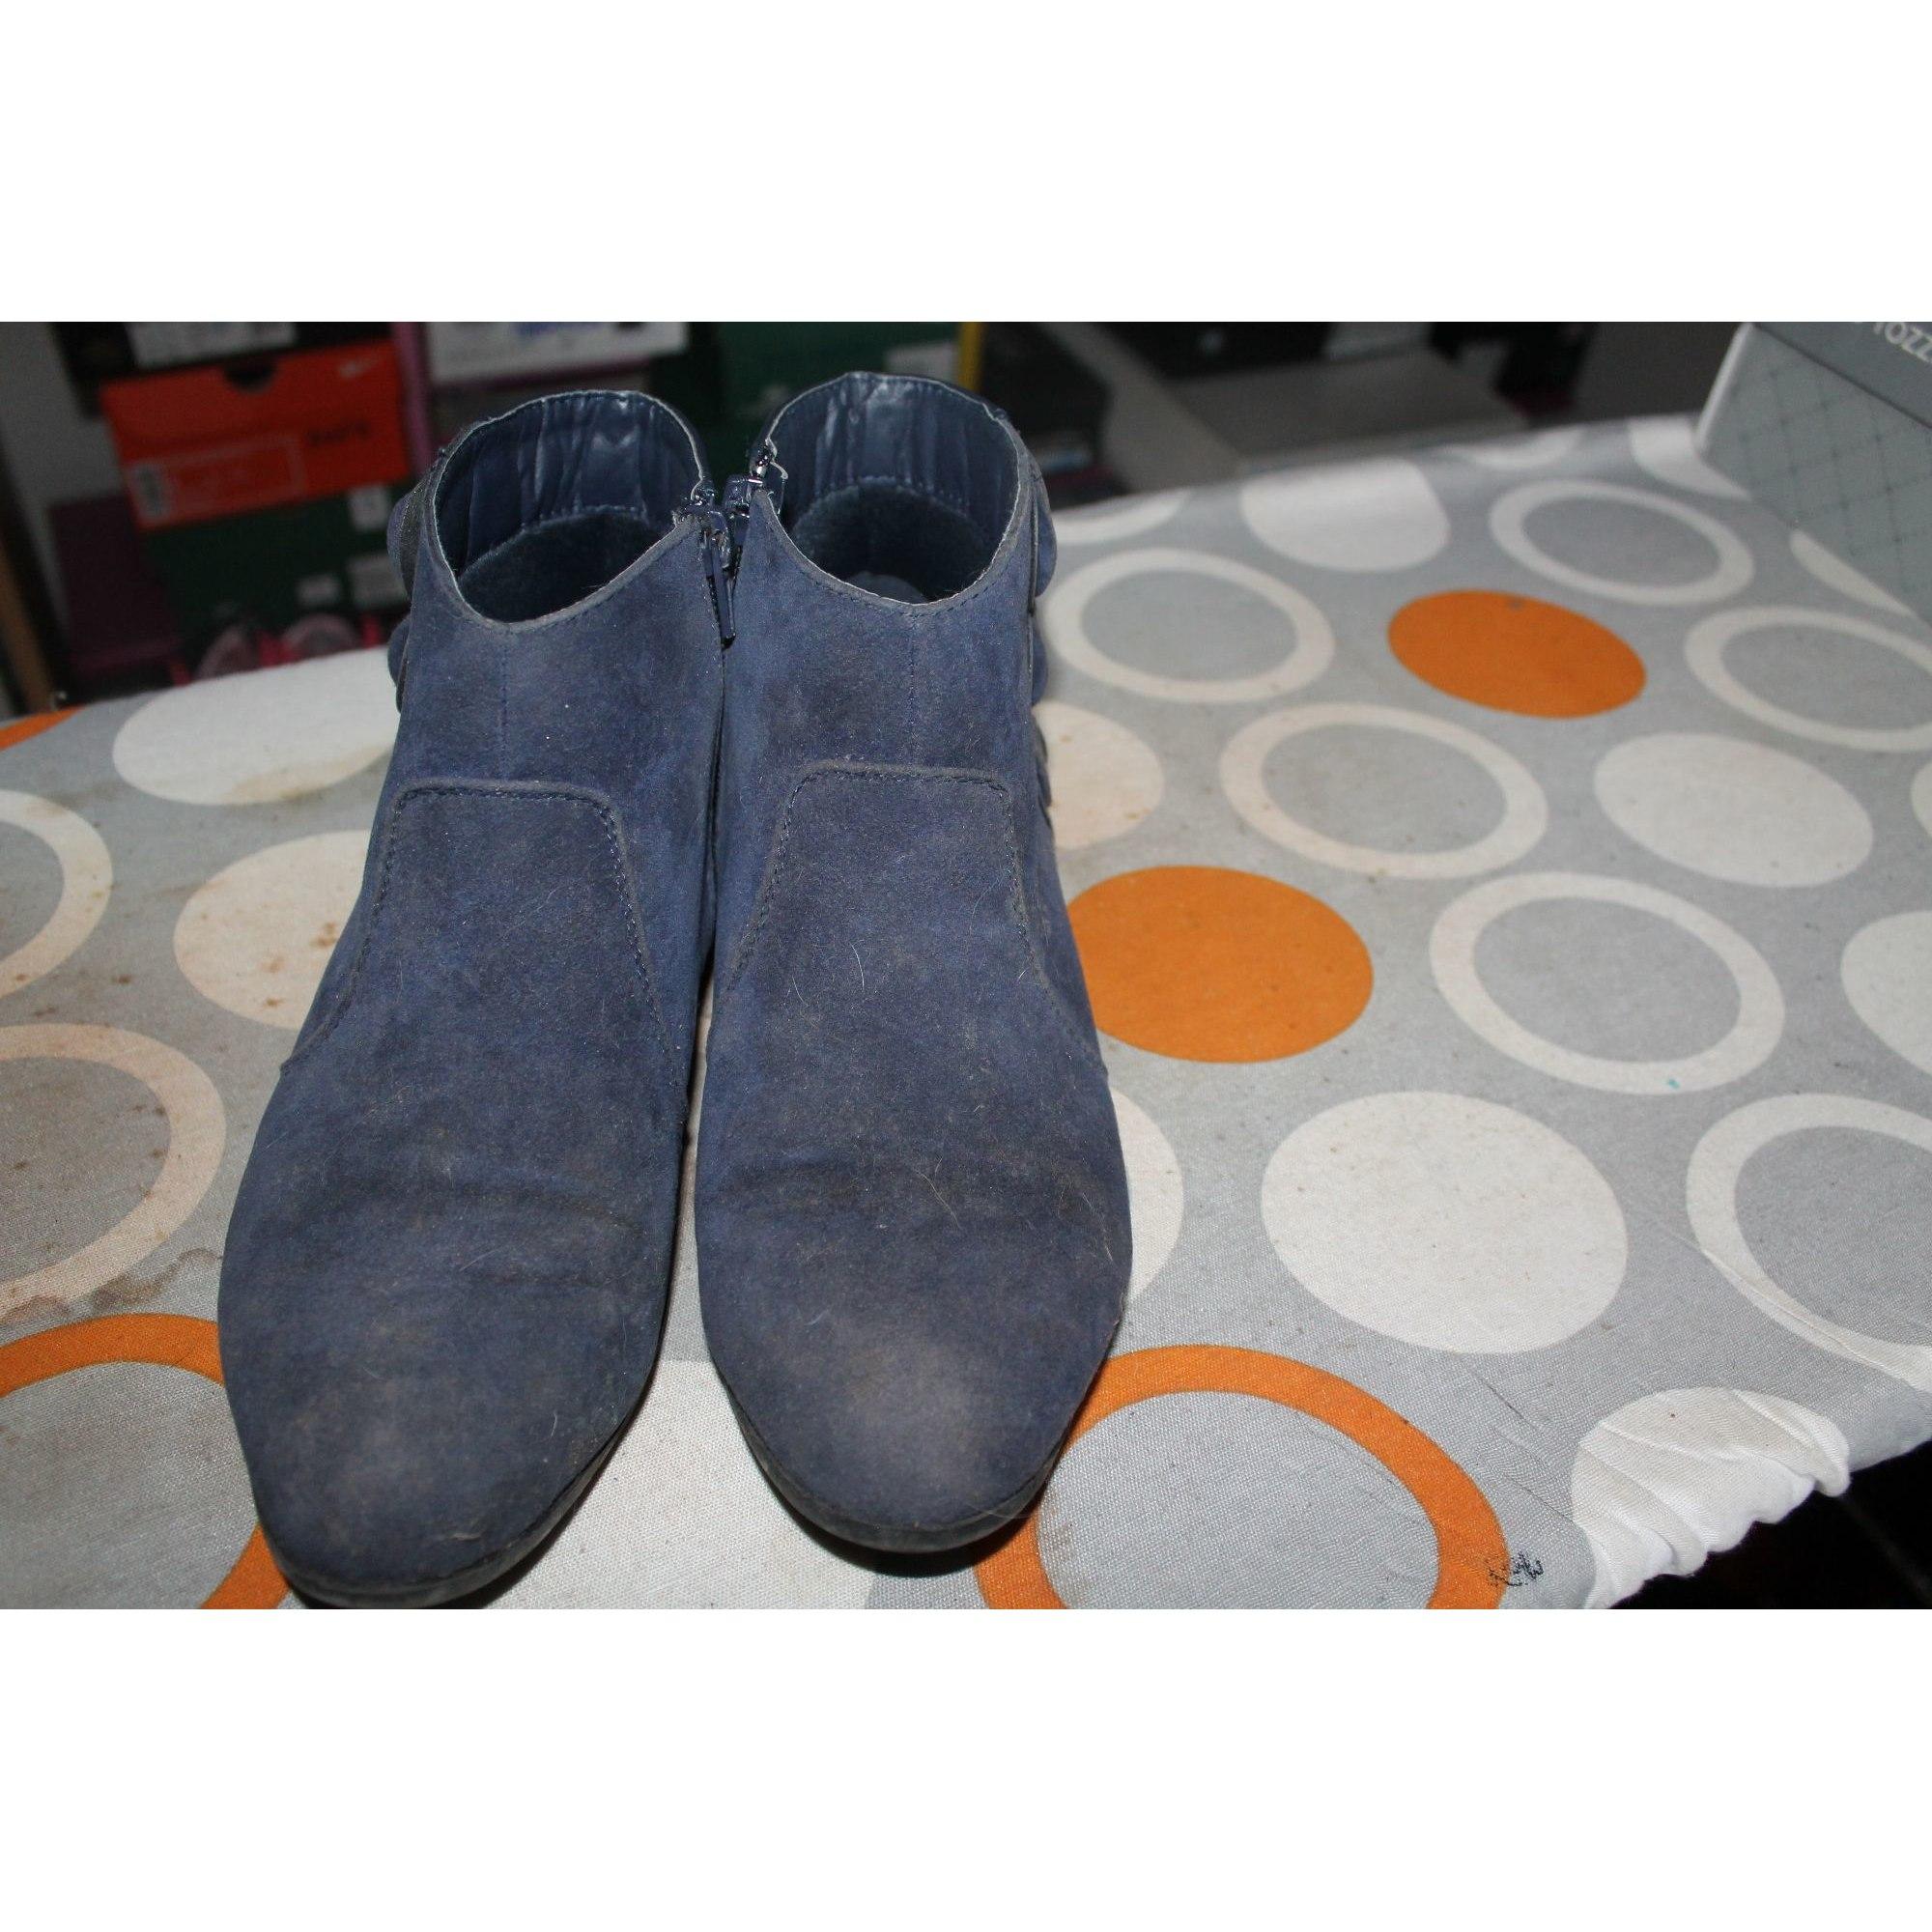 Bottines & low boots plates NAF NAF Bleu, bleu marine, bleu turquoise